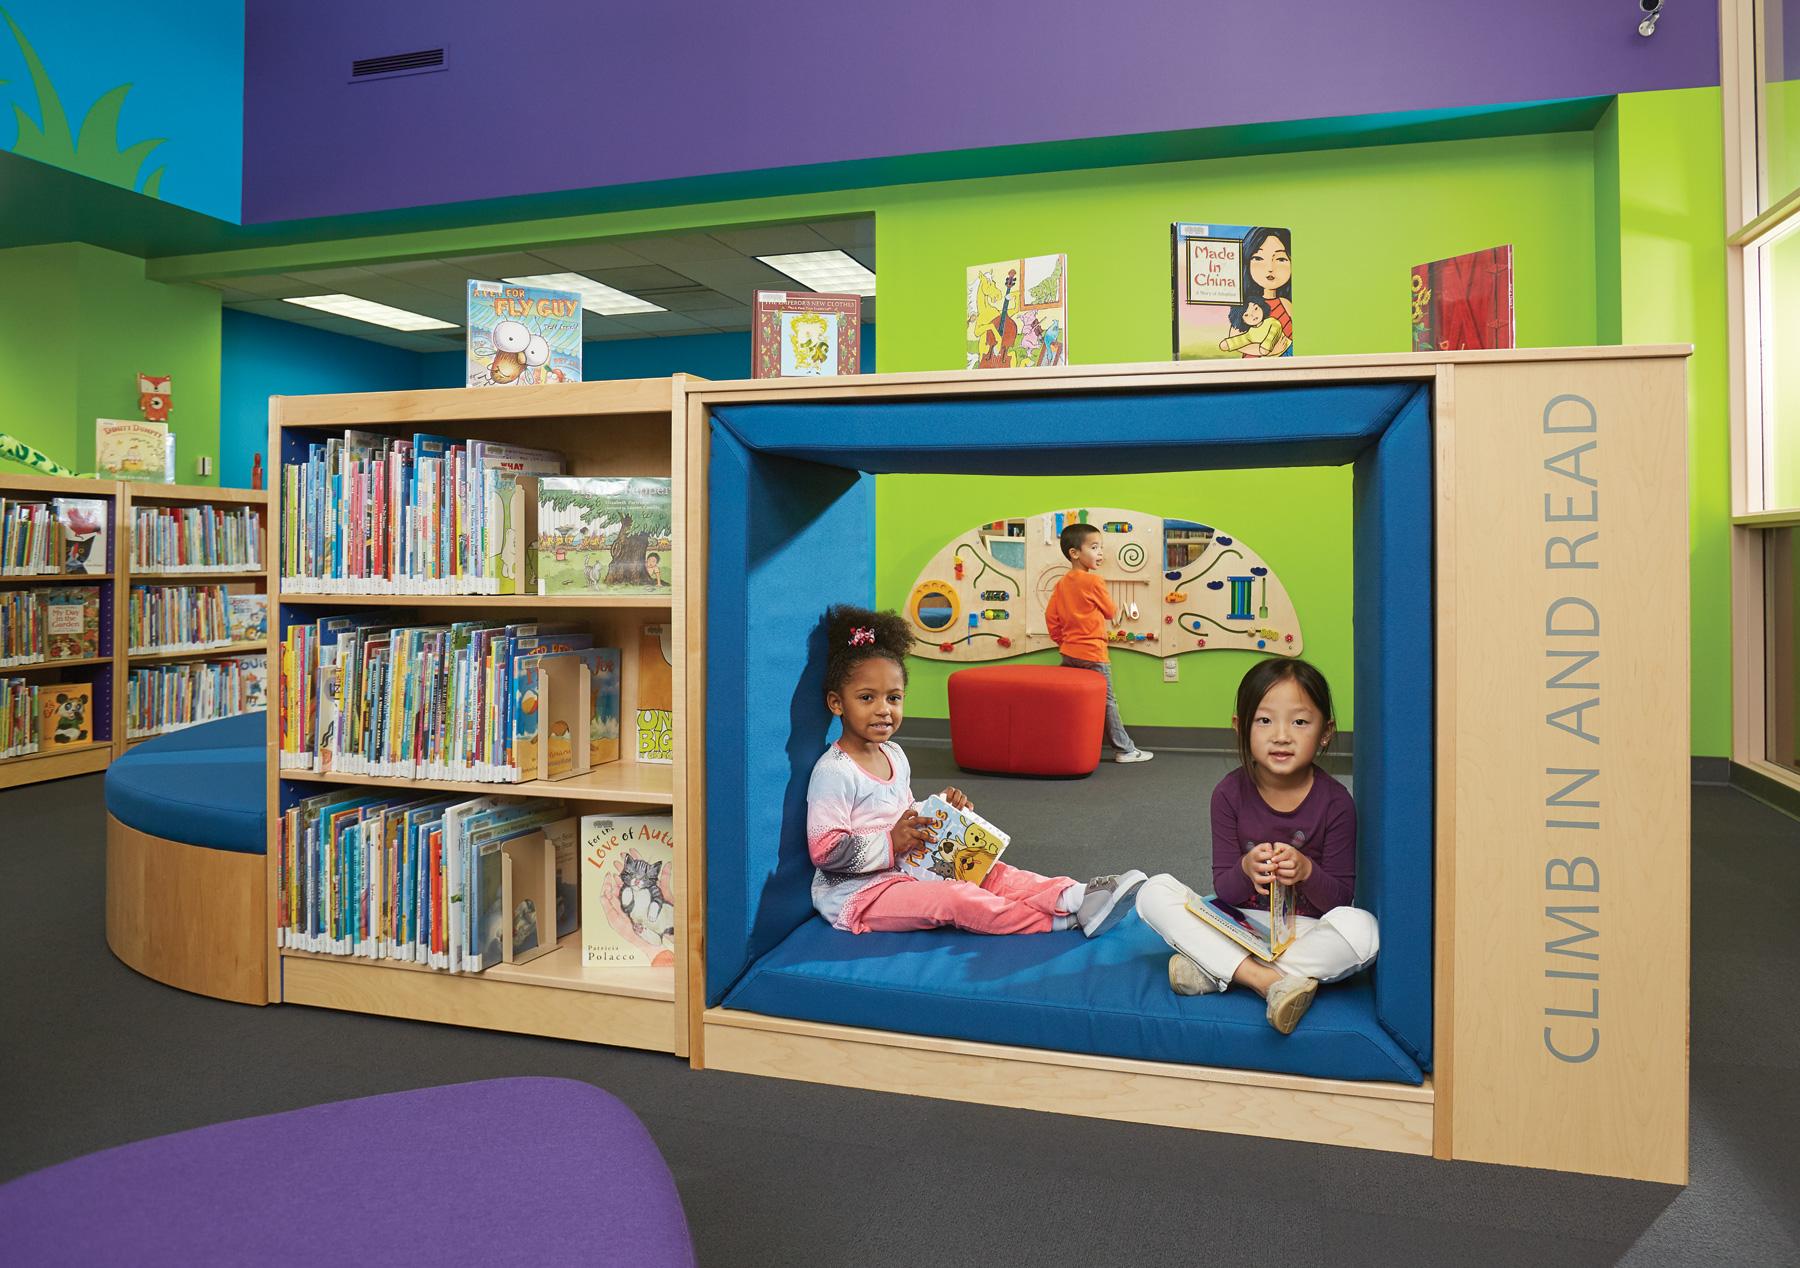 Kenosha public library idea gallery - Virtual room designer upload photo ...